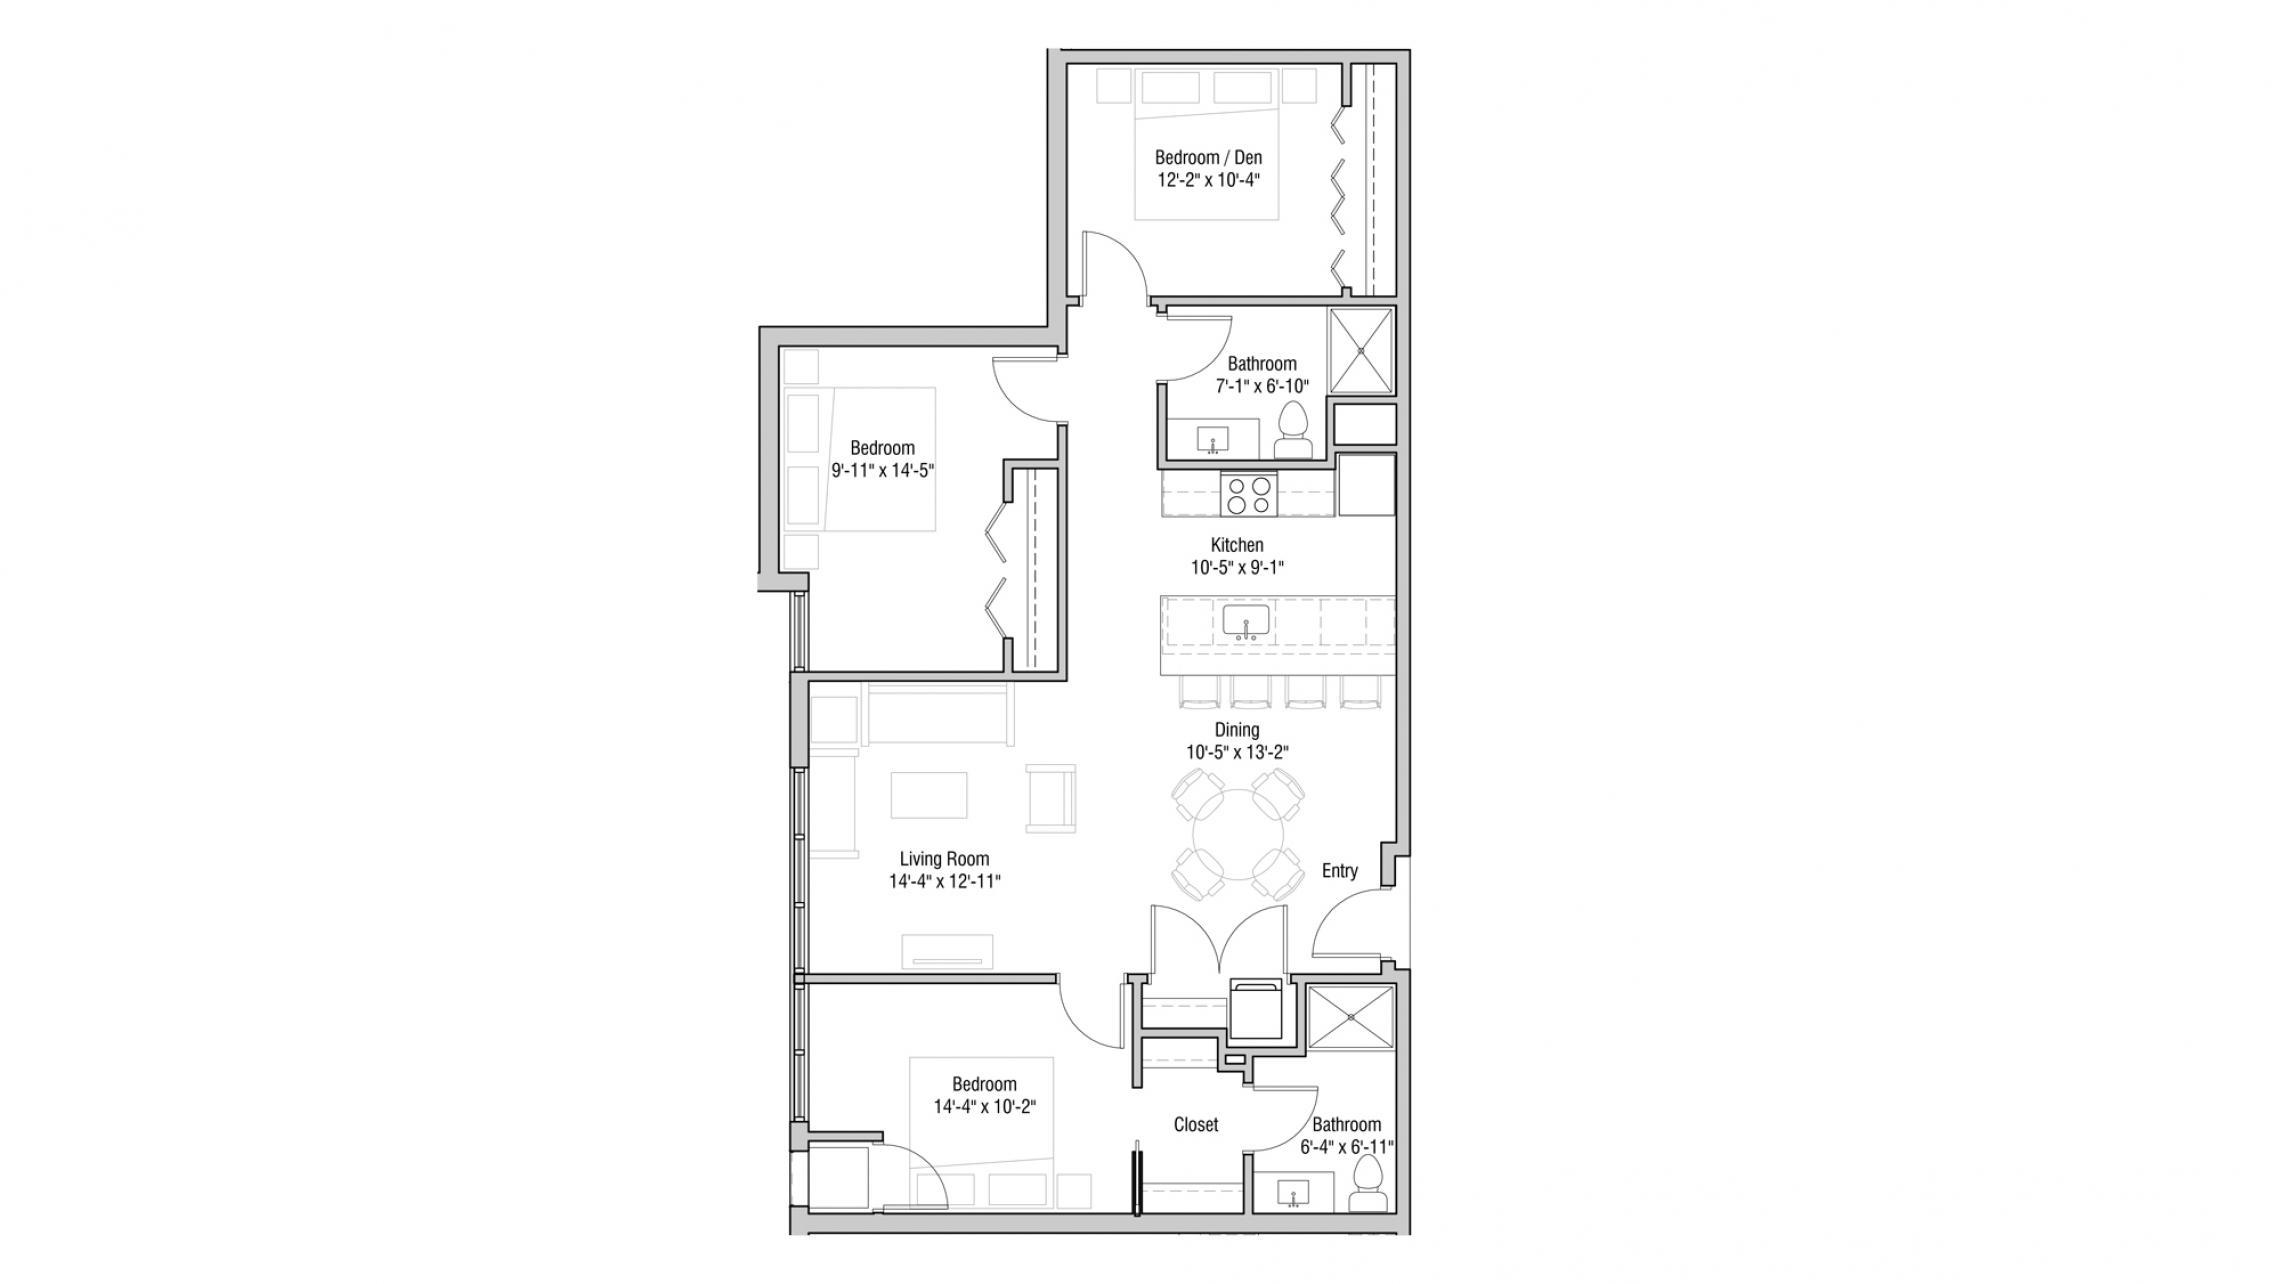 ULI Quarter Row 210 - Two Bedroom, Two Bathroom